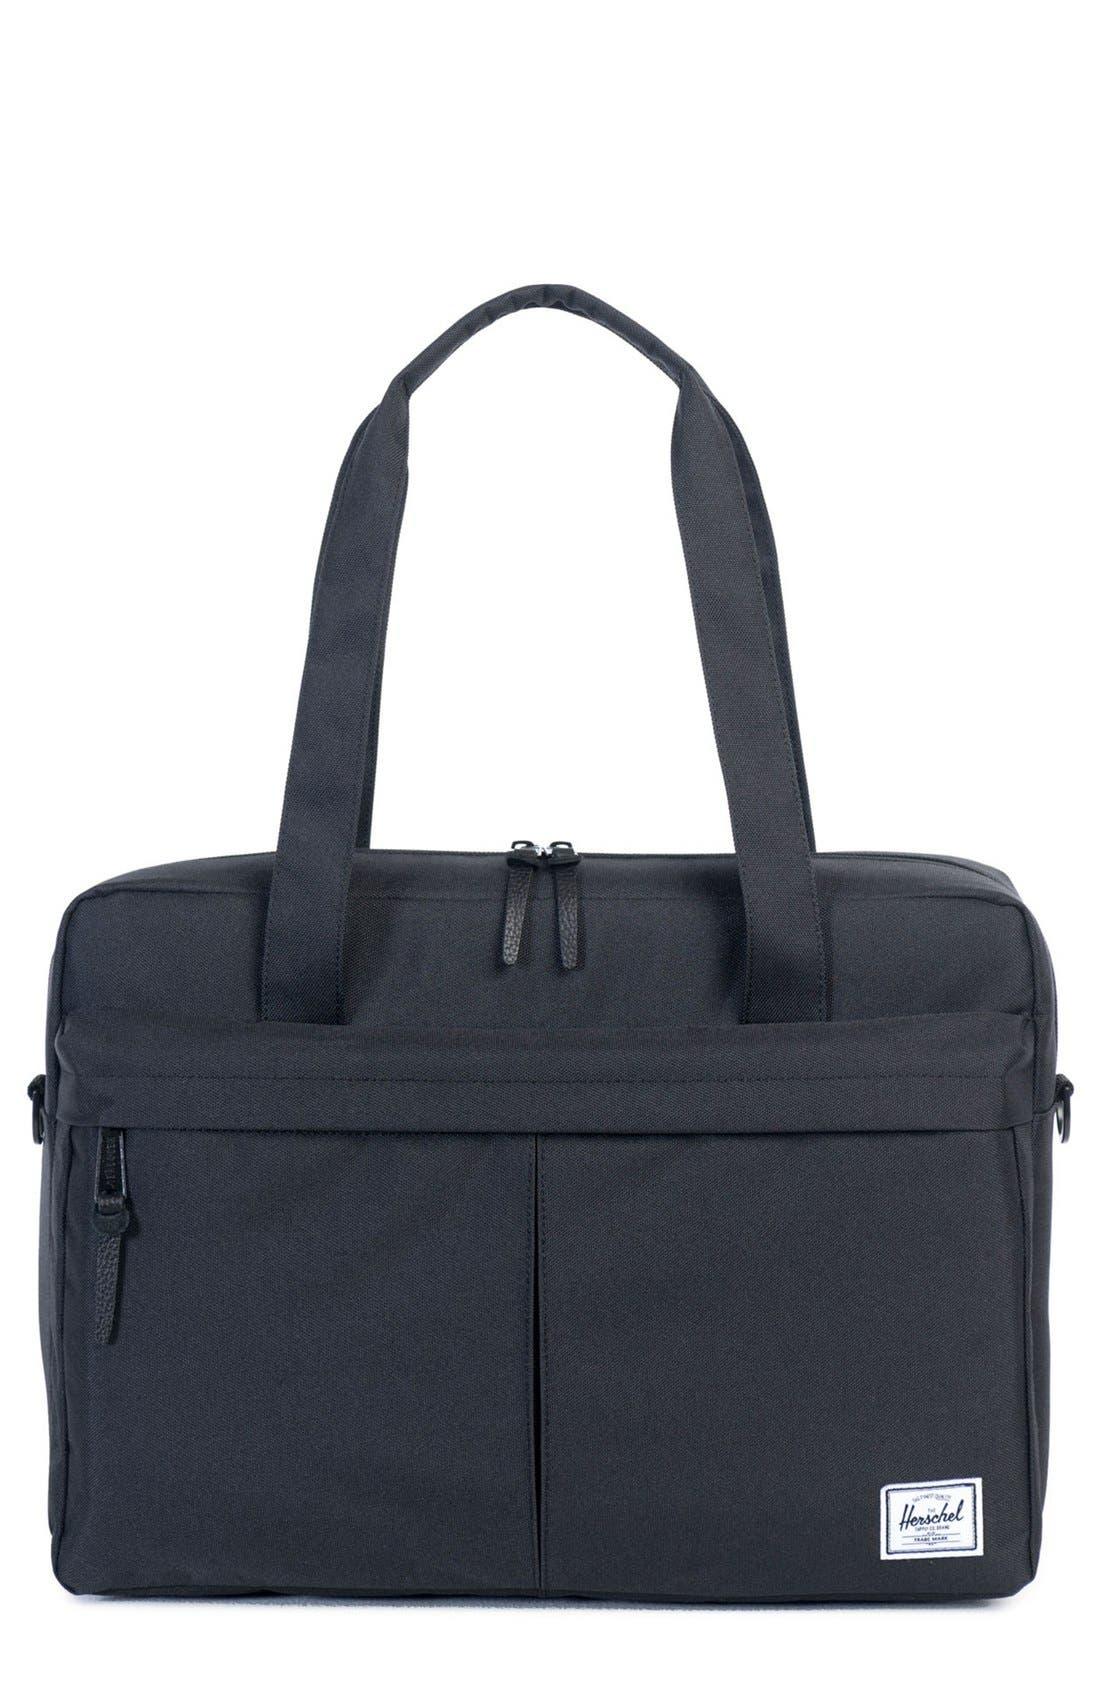 'Gibson' Messenger Bag,                             Main thumbnail 1, color,                             Black